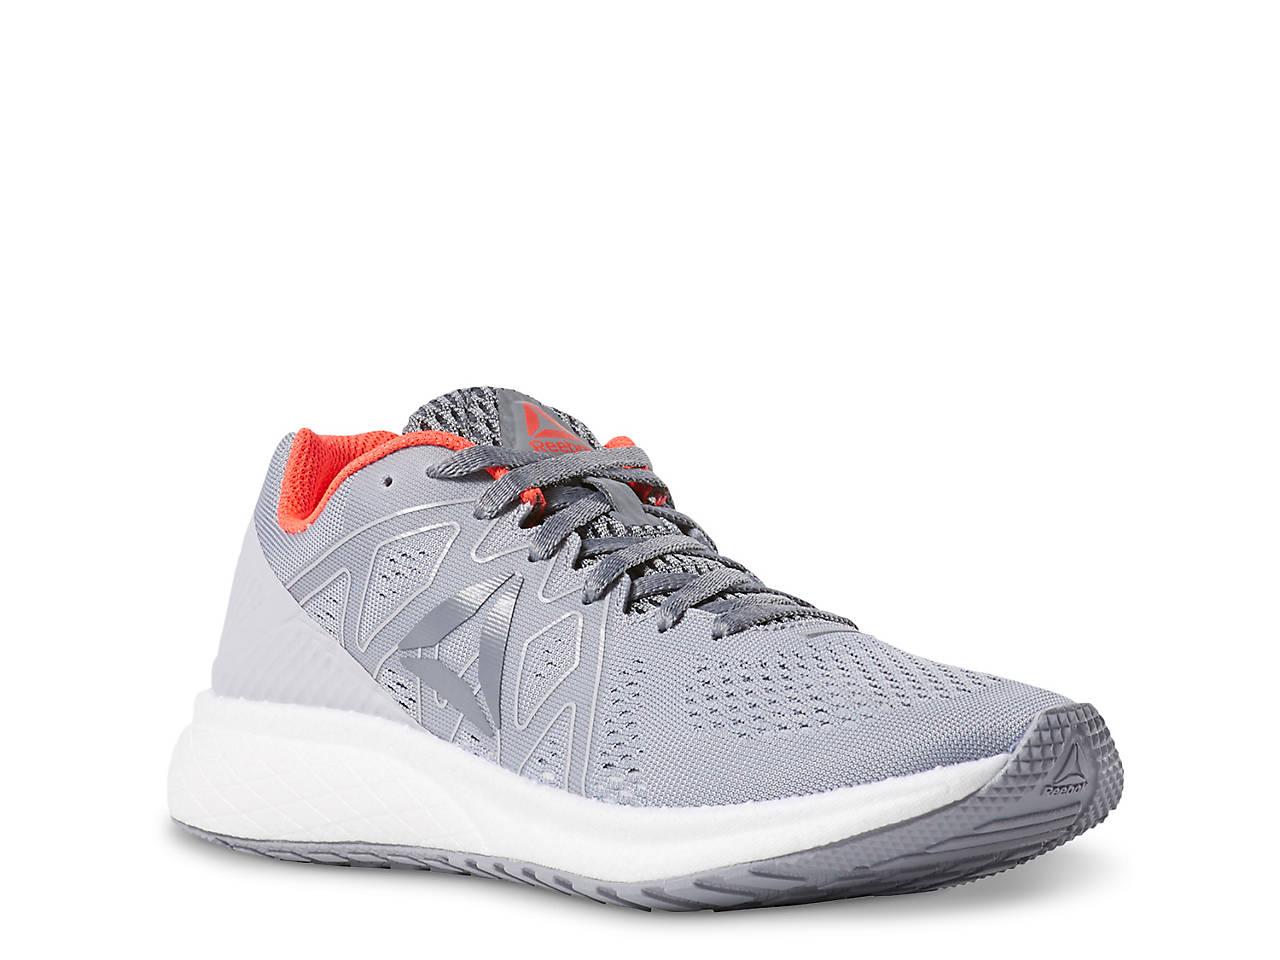 Reebok Forever Floatride Energy Running Shoe - Women s Women s Shoes ... 0aaffcf15